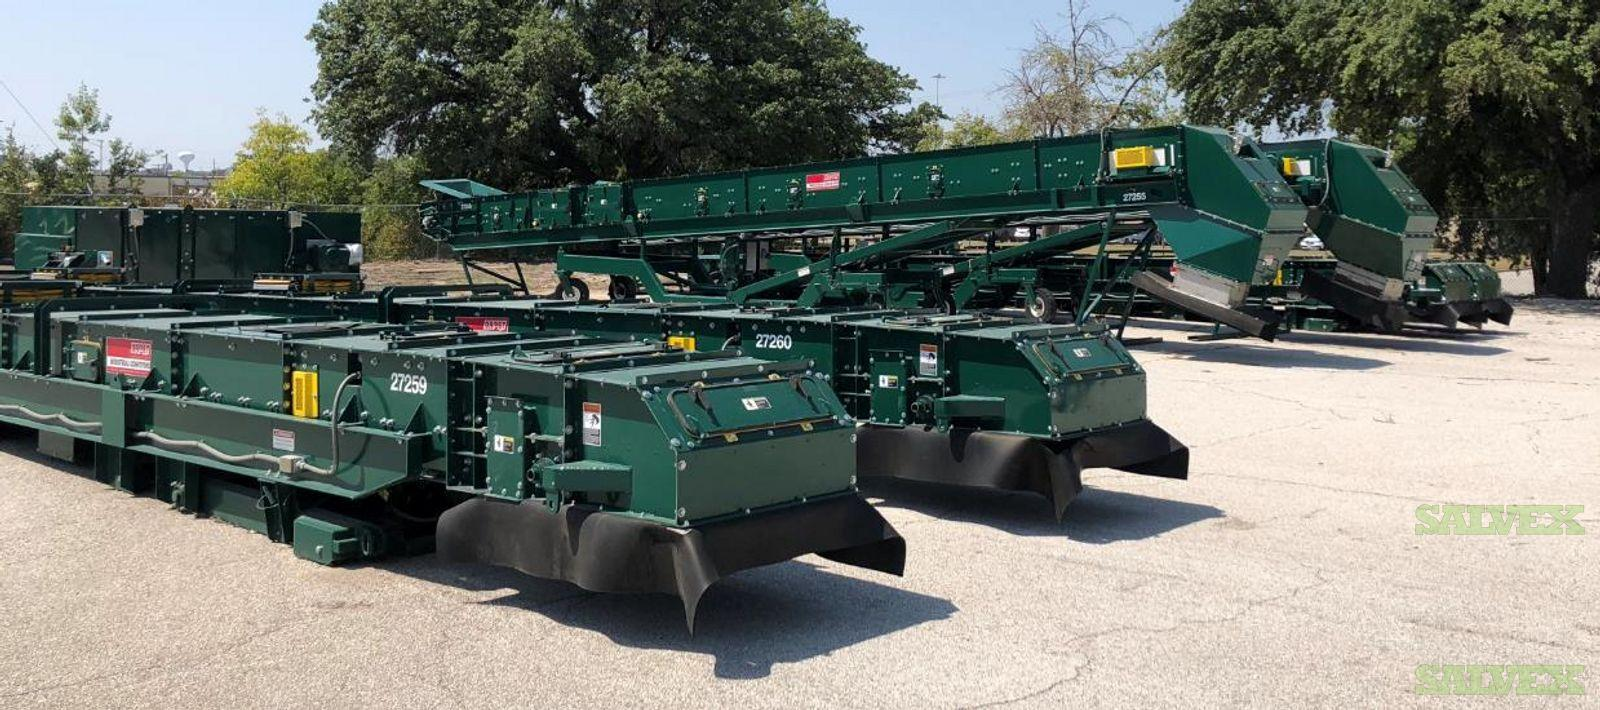 Rapat Conveyors (2 Units)